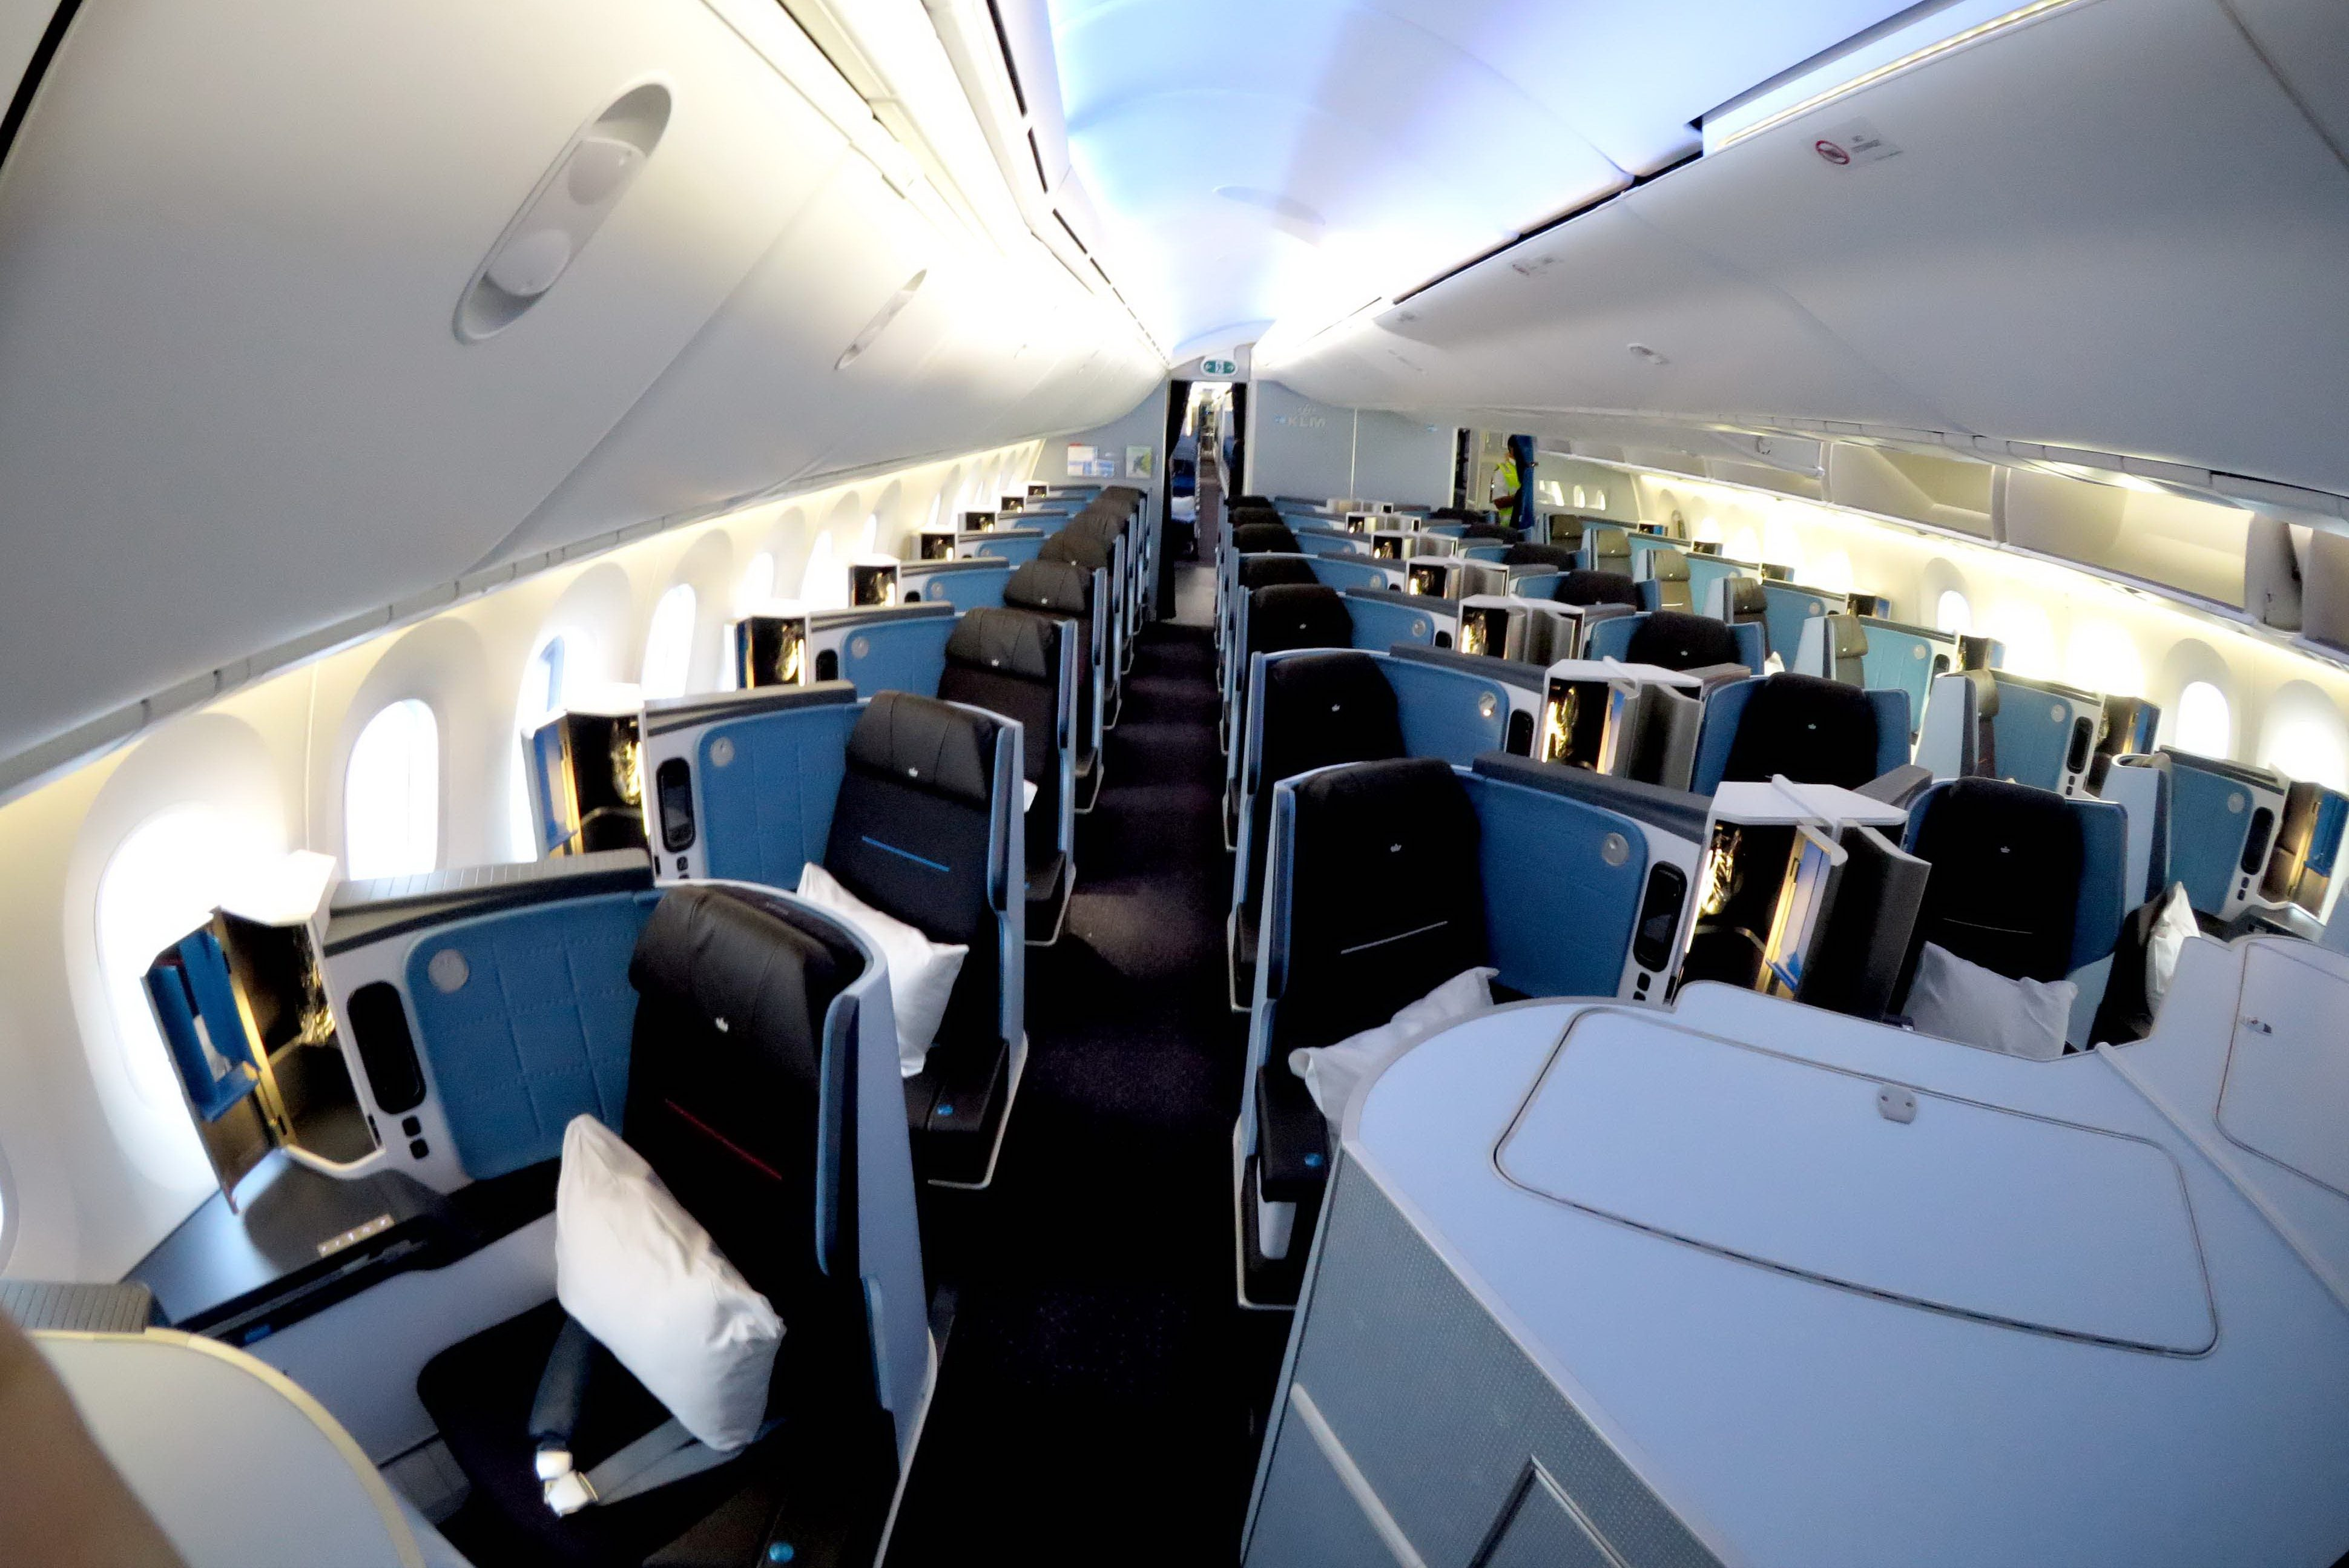 Agents Get Up Close Look At Klm S 787 Dreamliner Travelpress